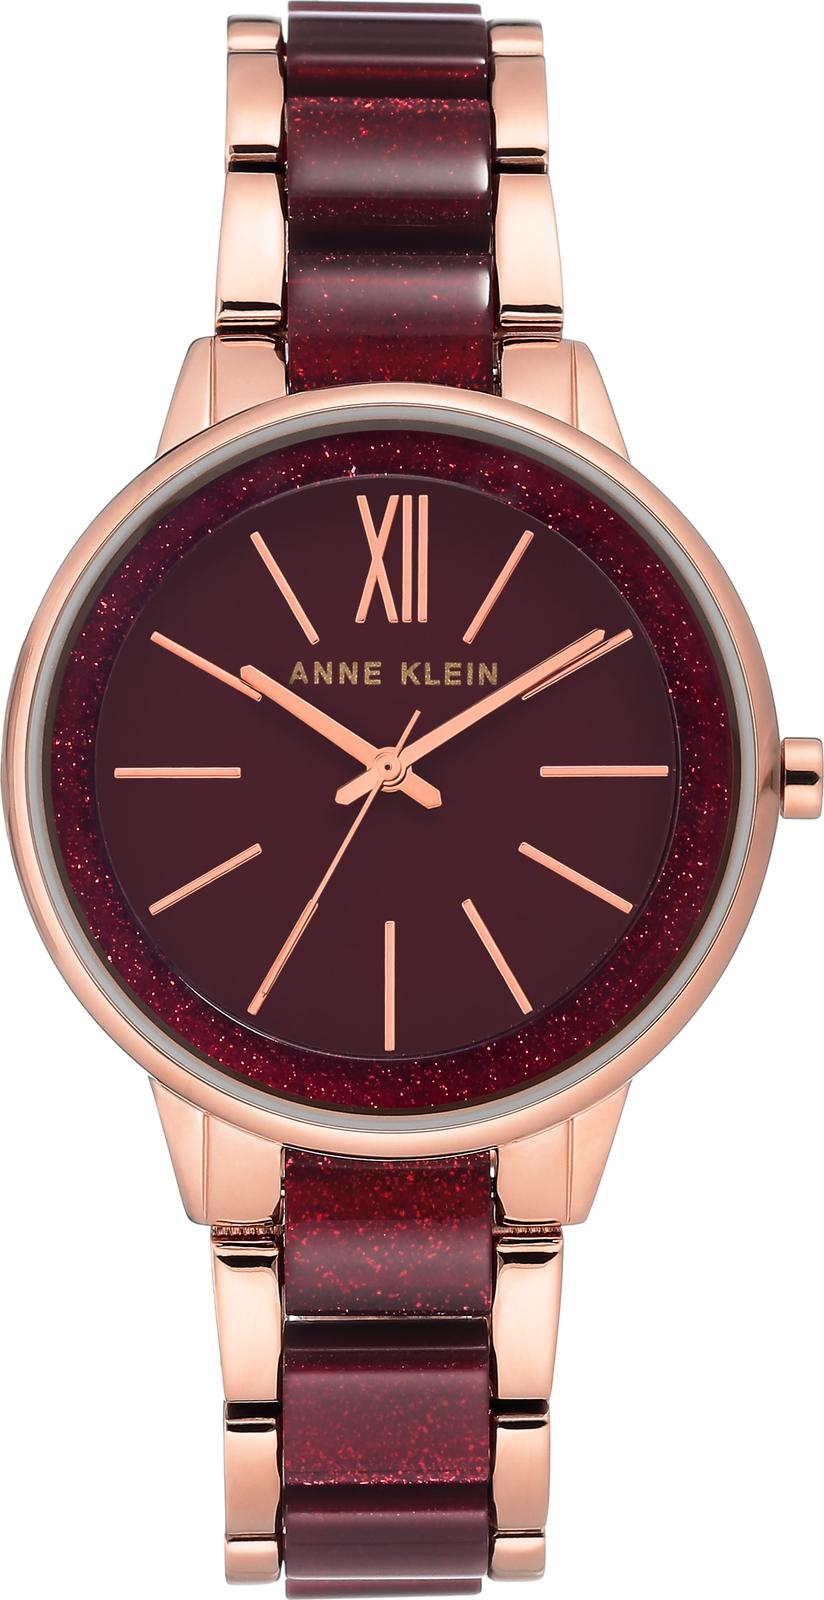 Наручные часы Anne Klein женские бордовый женские часы anne klein 3352pkst